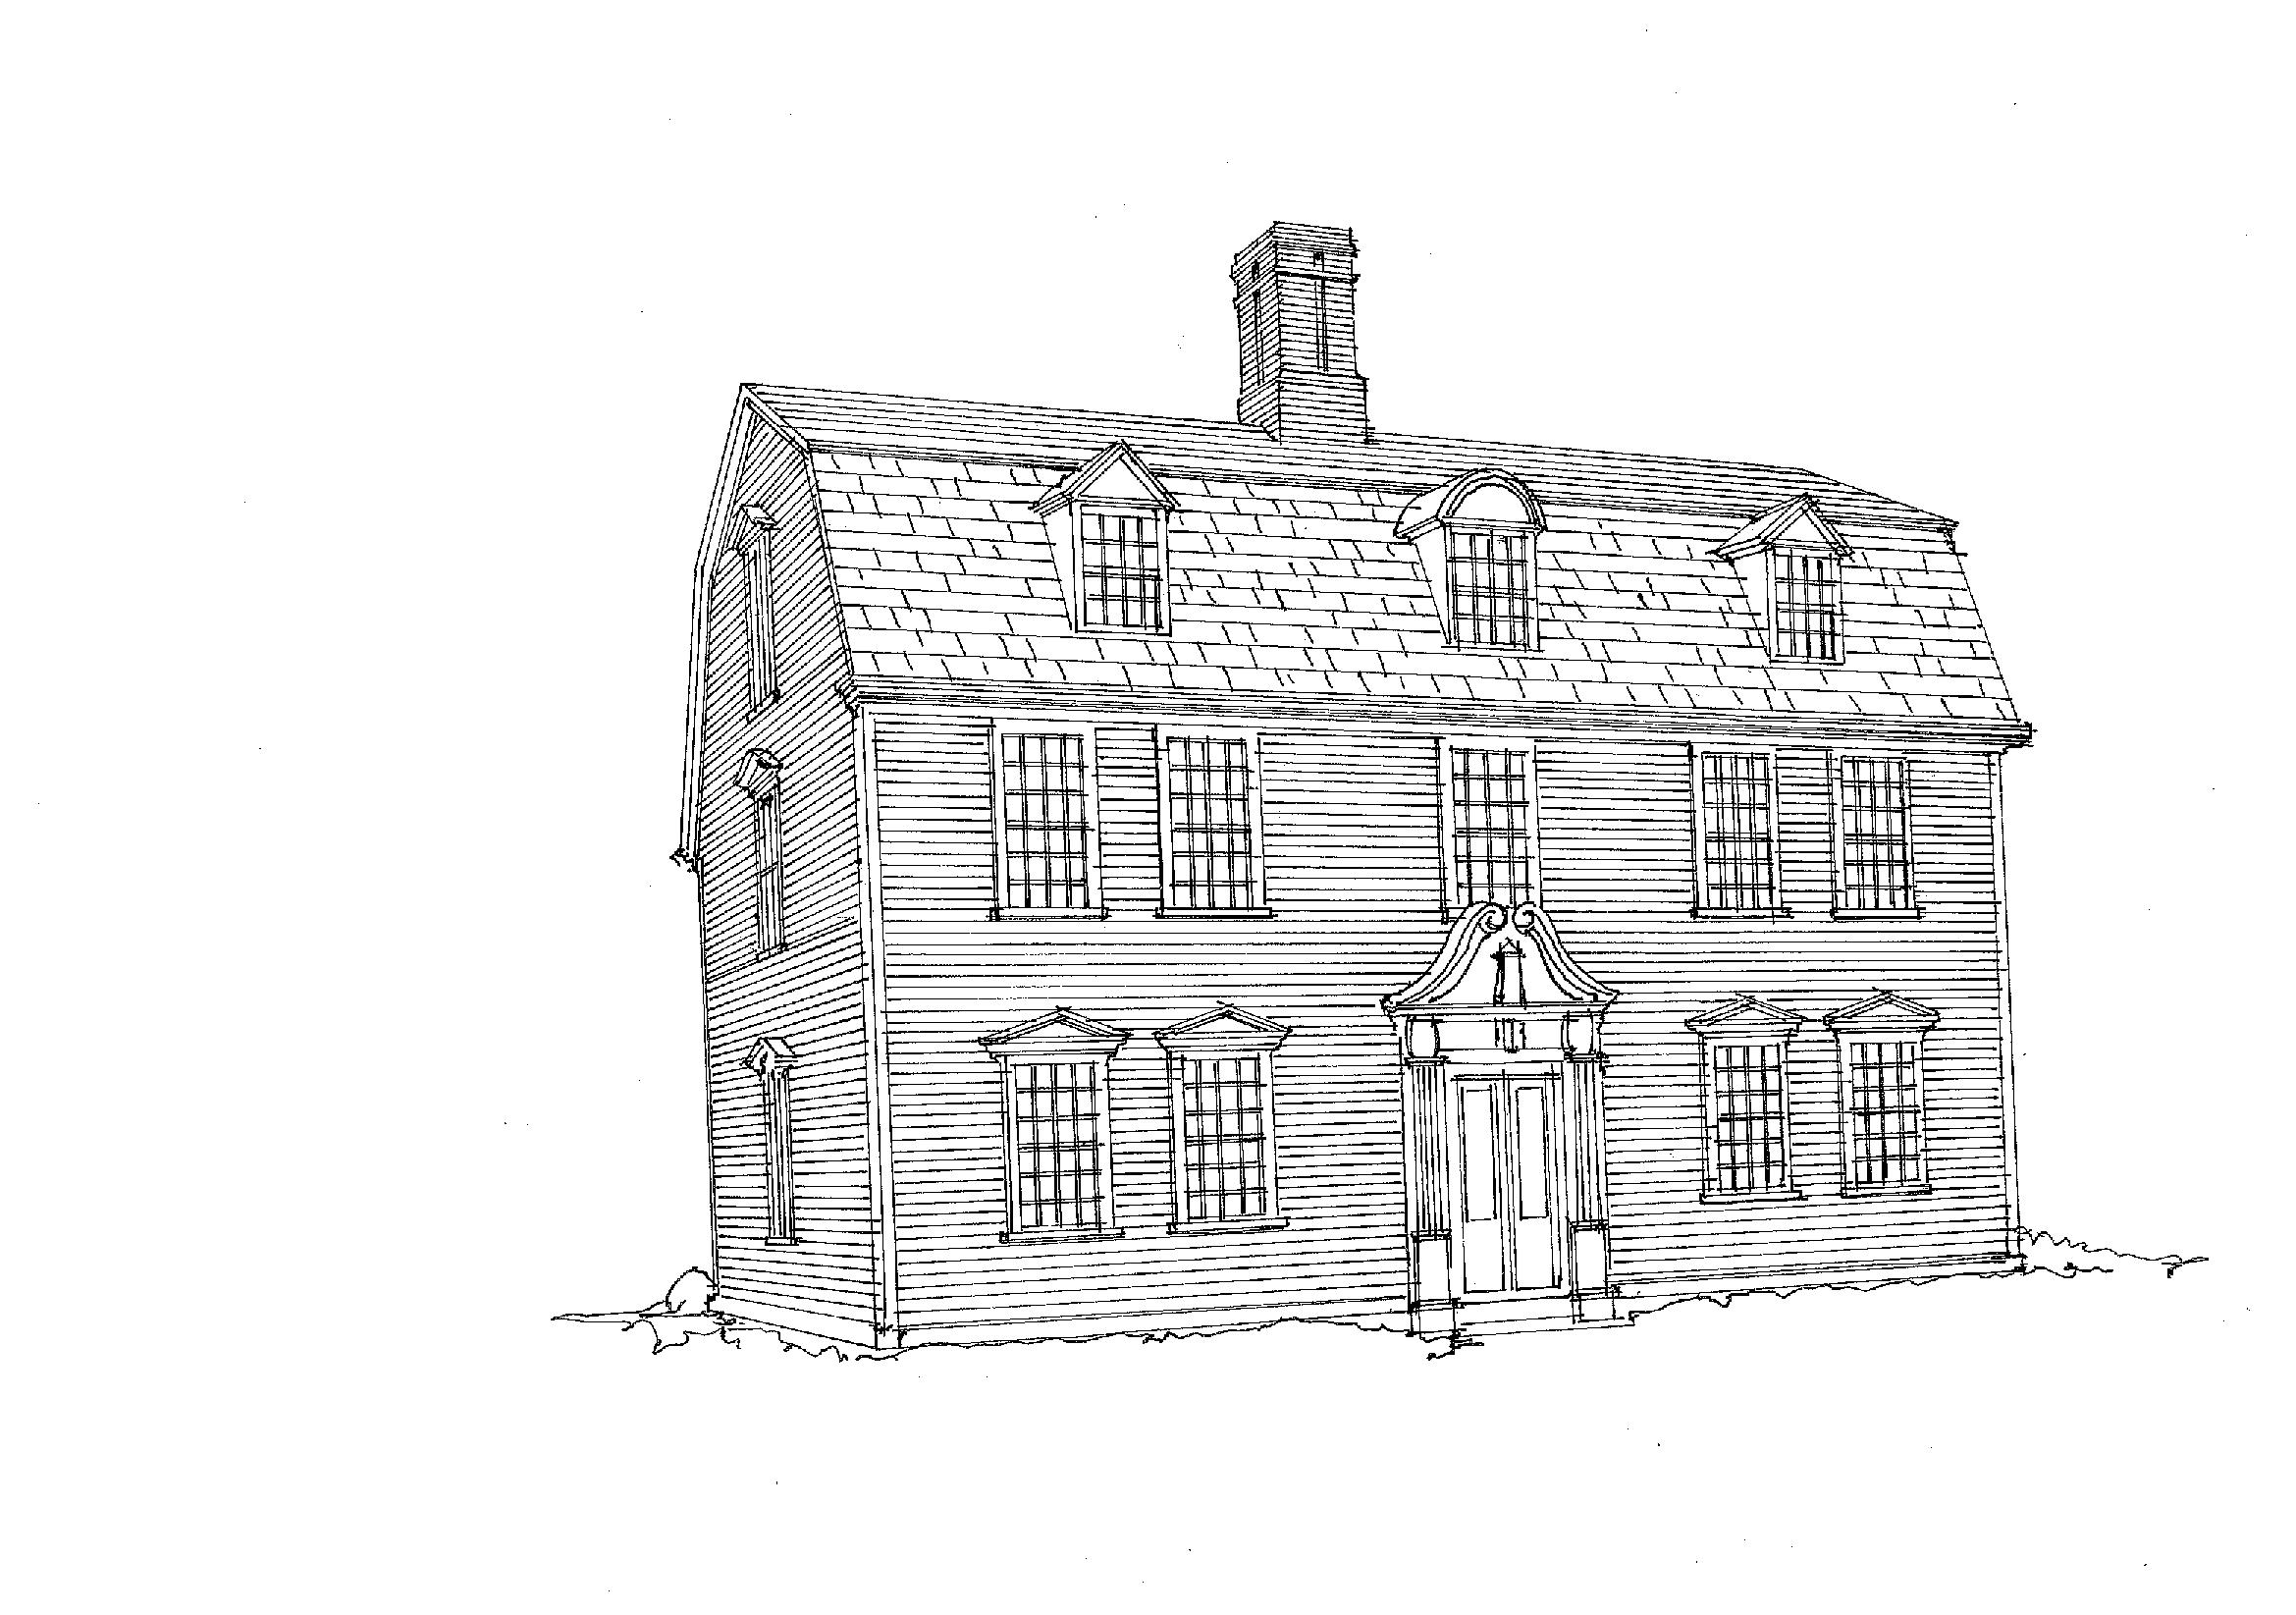 Dwight House (ca. 1754)